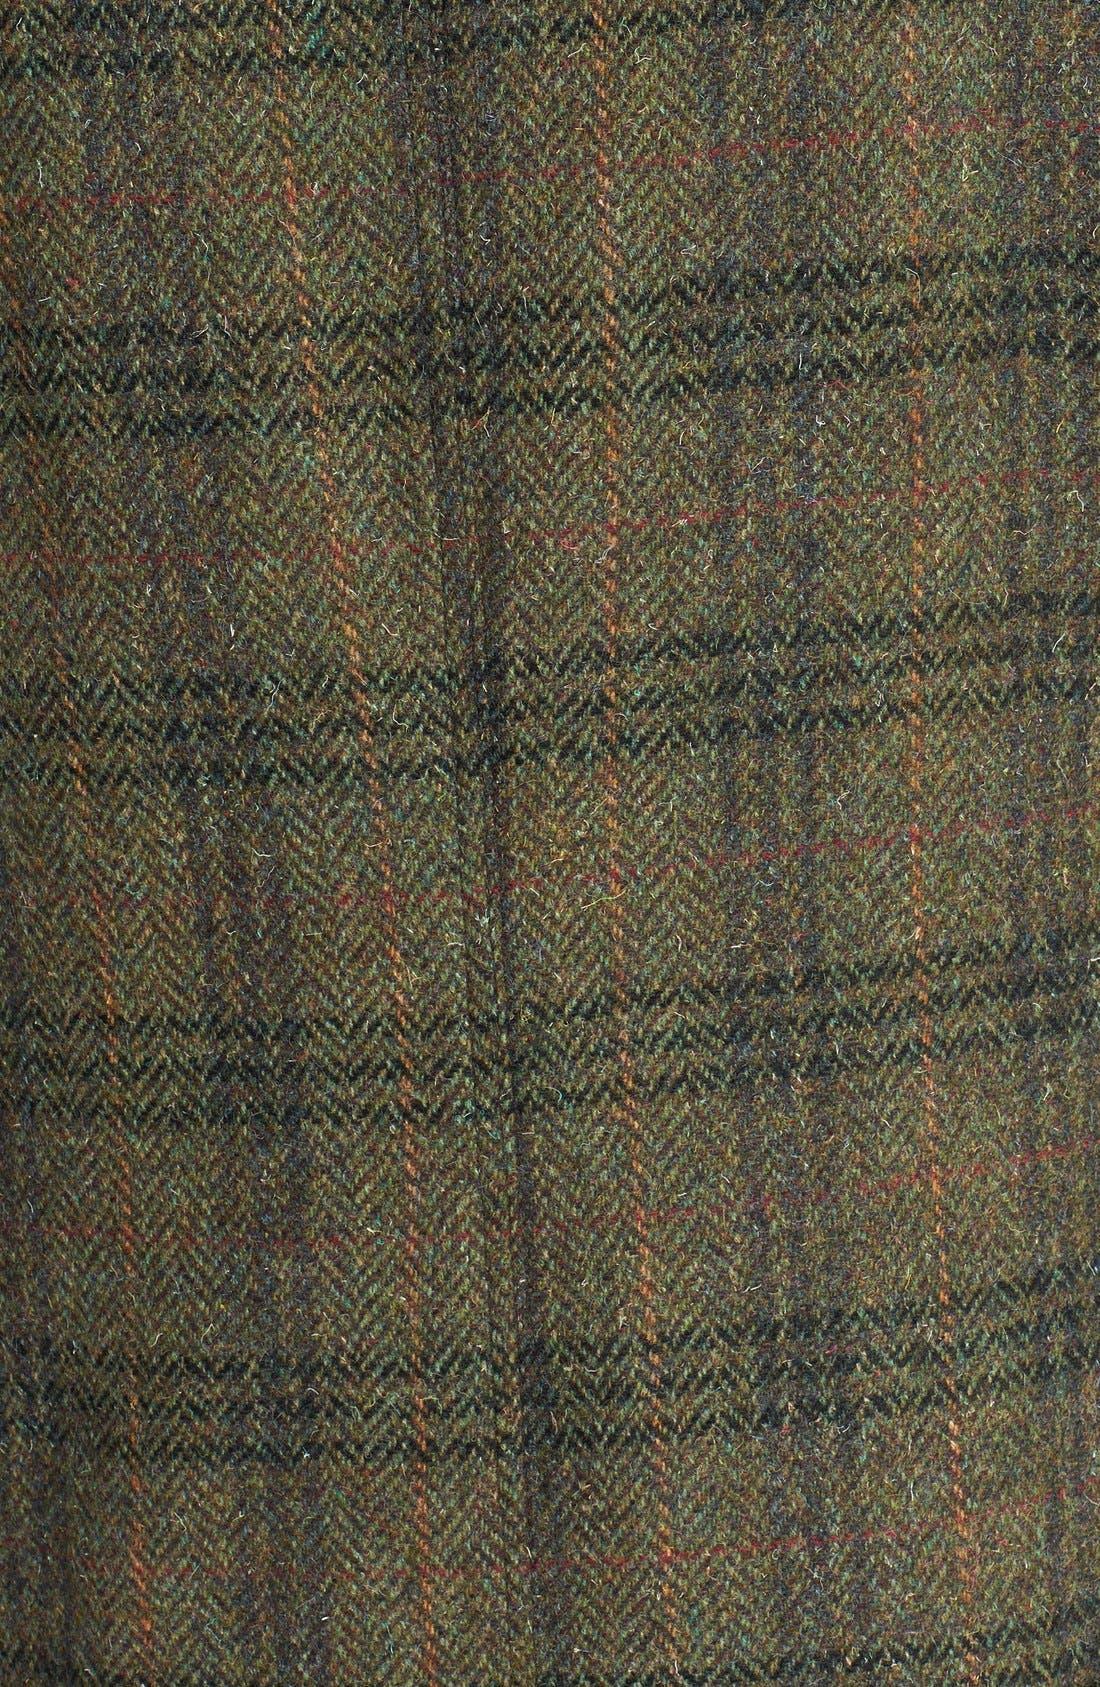 Alternate Image 3  - Barbour 'Beadnell - Edworth Tweed' Plaid Wool Coat